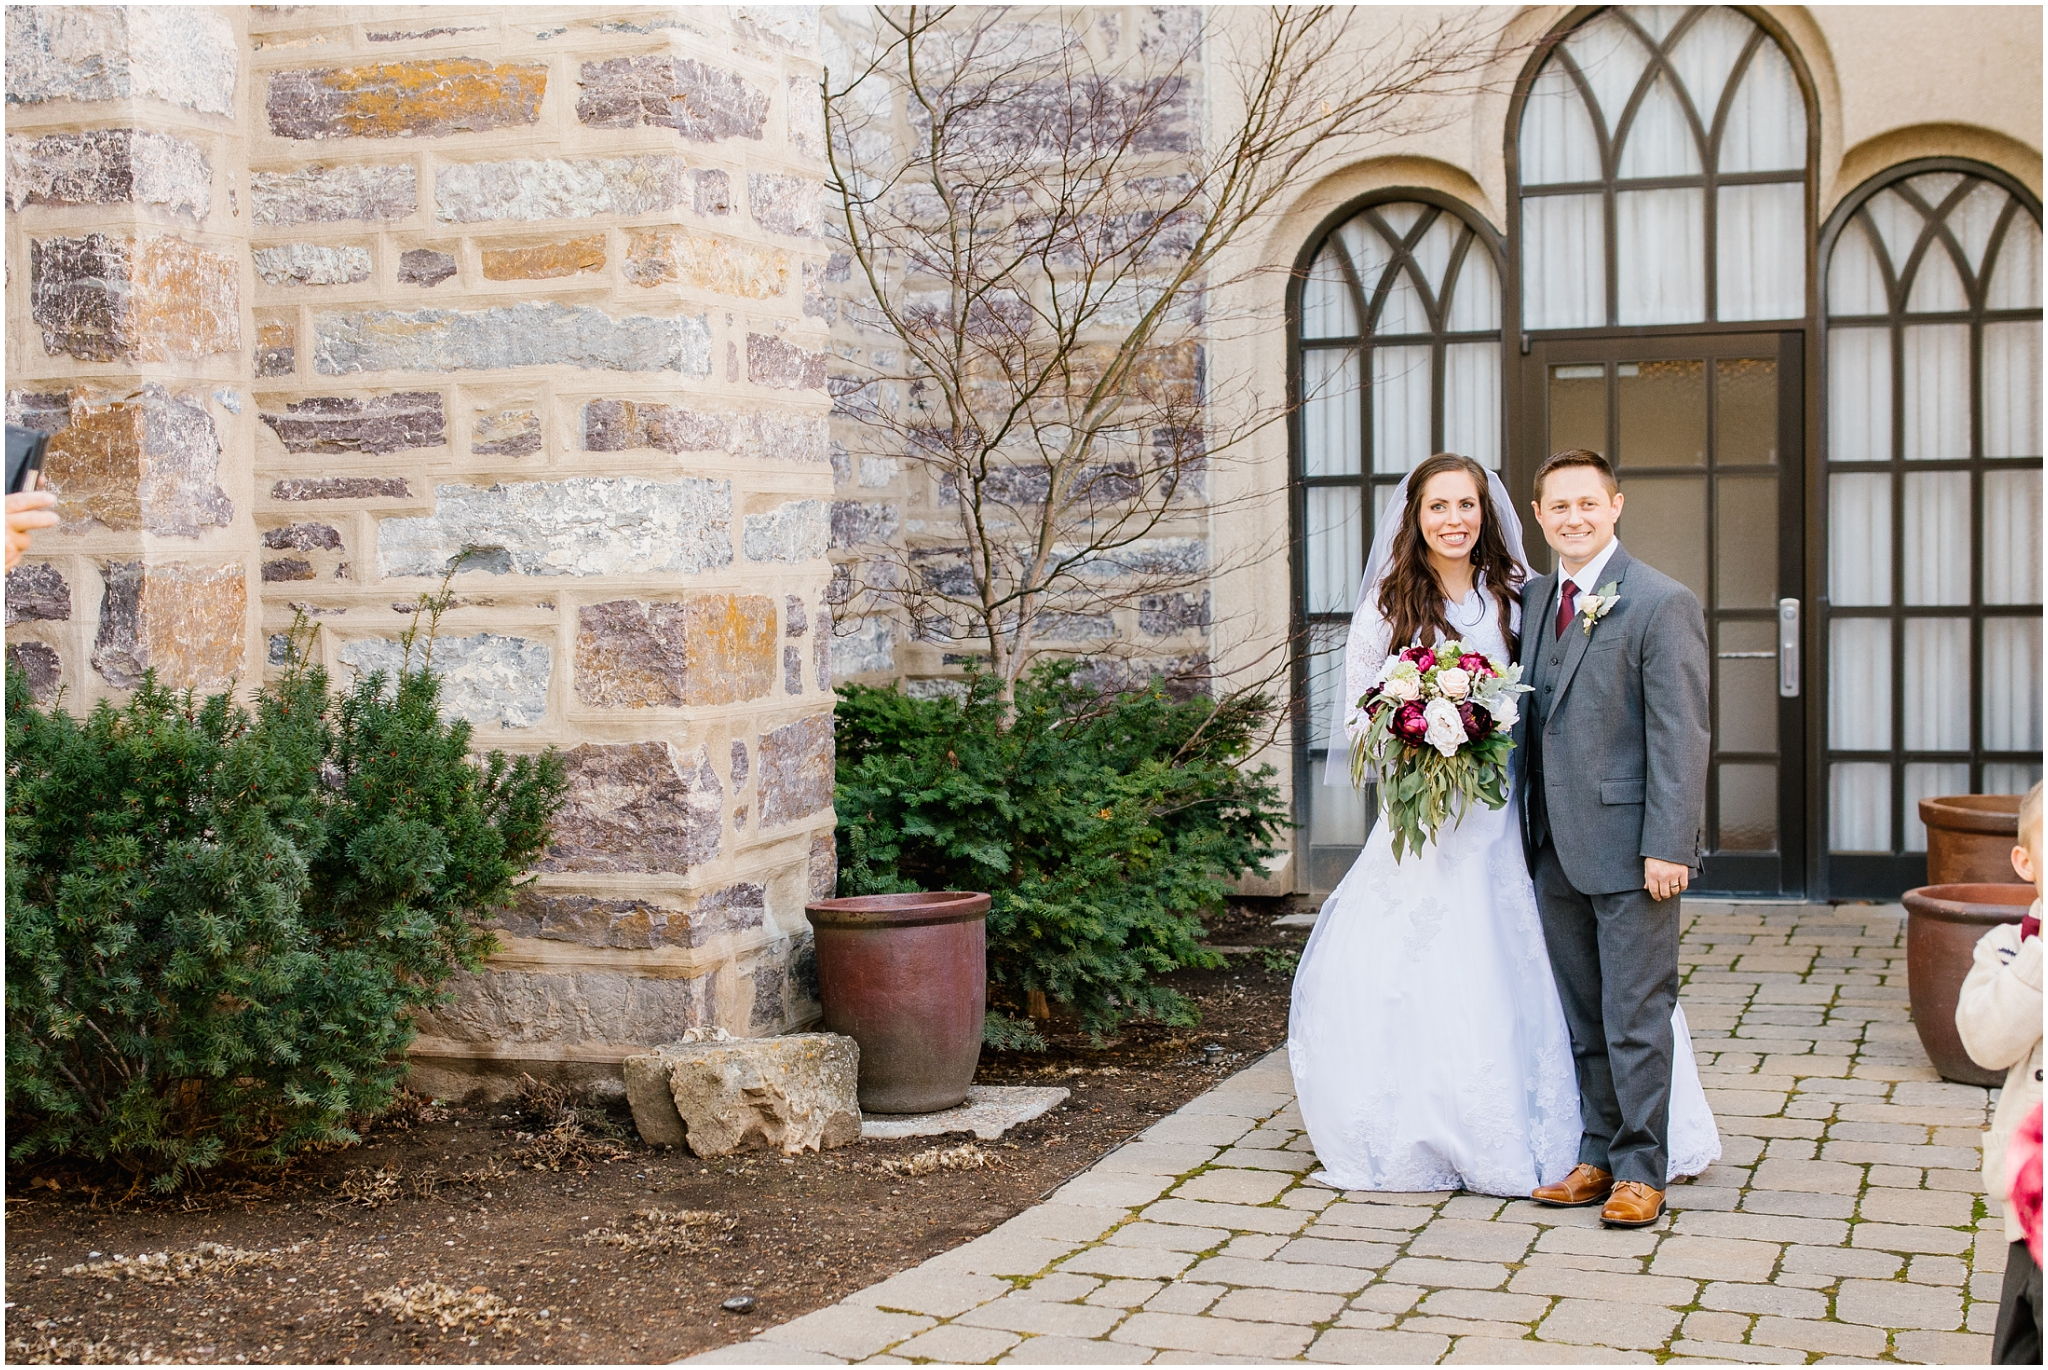 SS-Wedding-24_Lizzie-B-Imagery-Idaho-Utah-Wedding-Photographer-Salt-Lake-City-Park-City-Logan-Utah-Temple.jpg